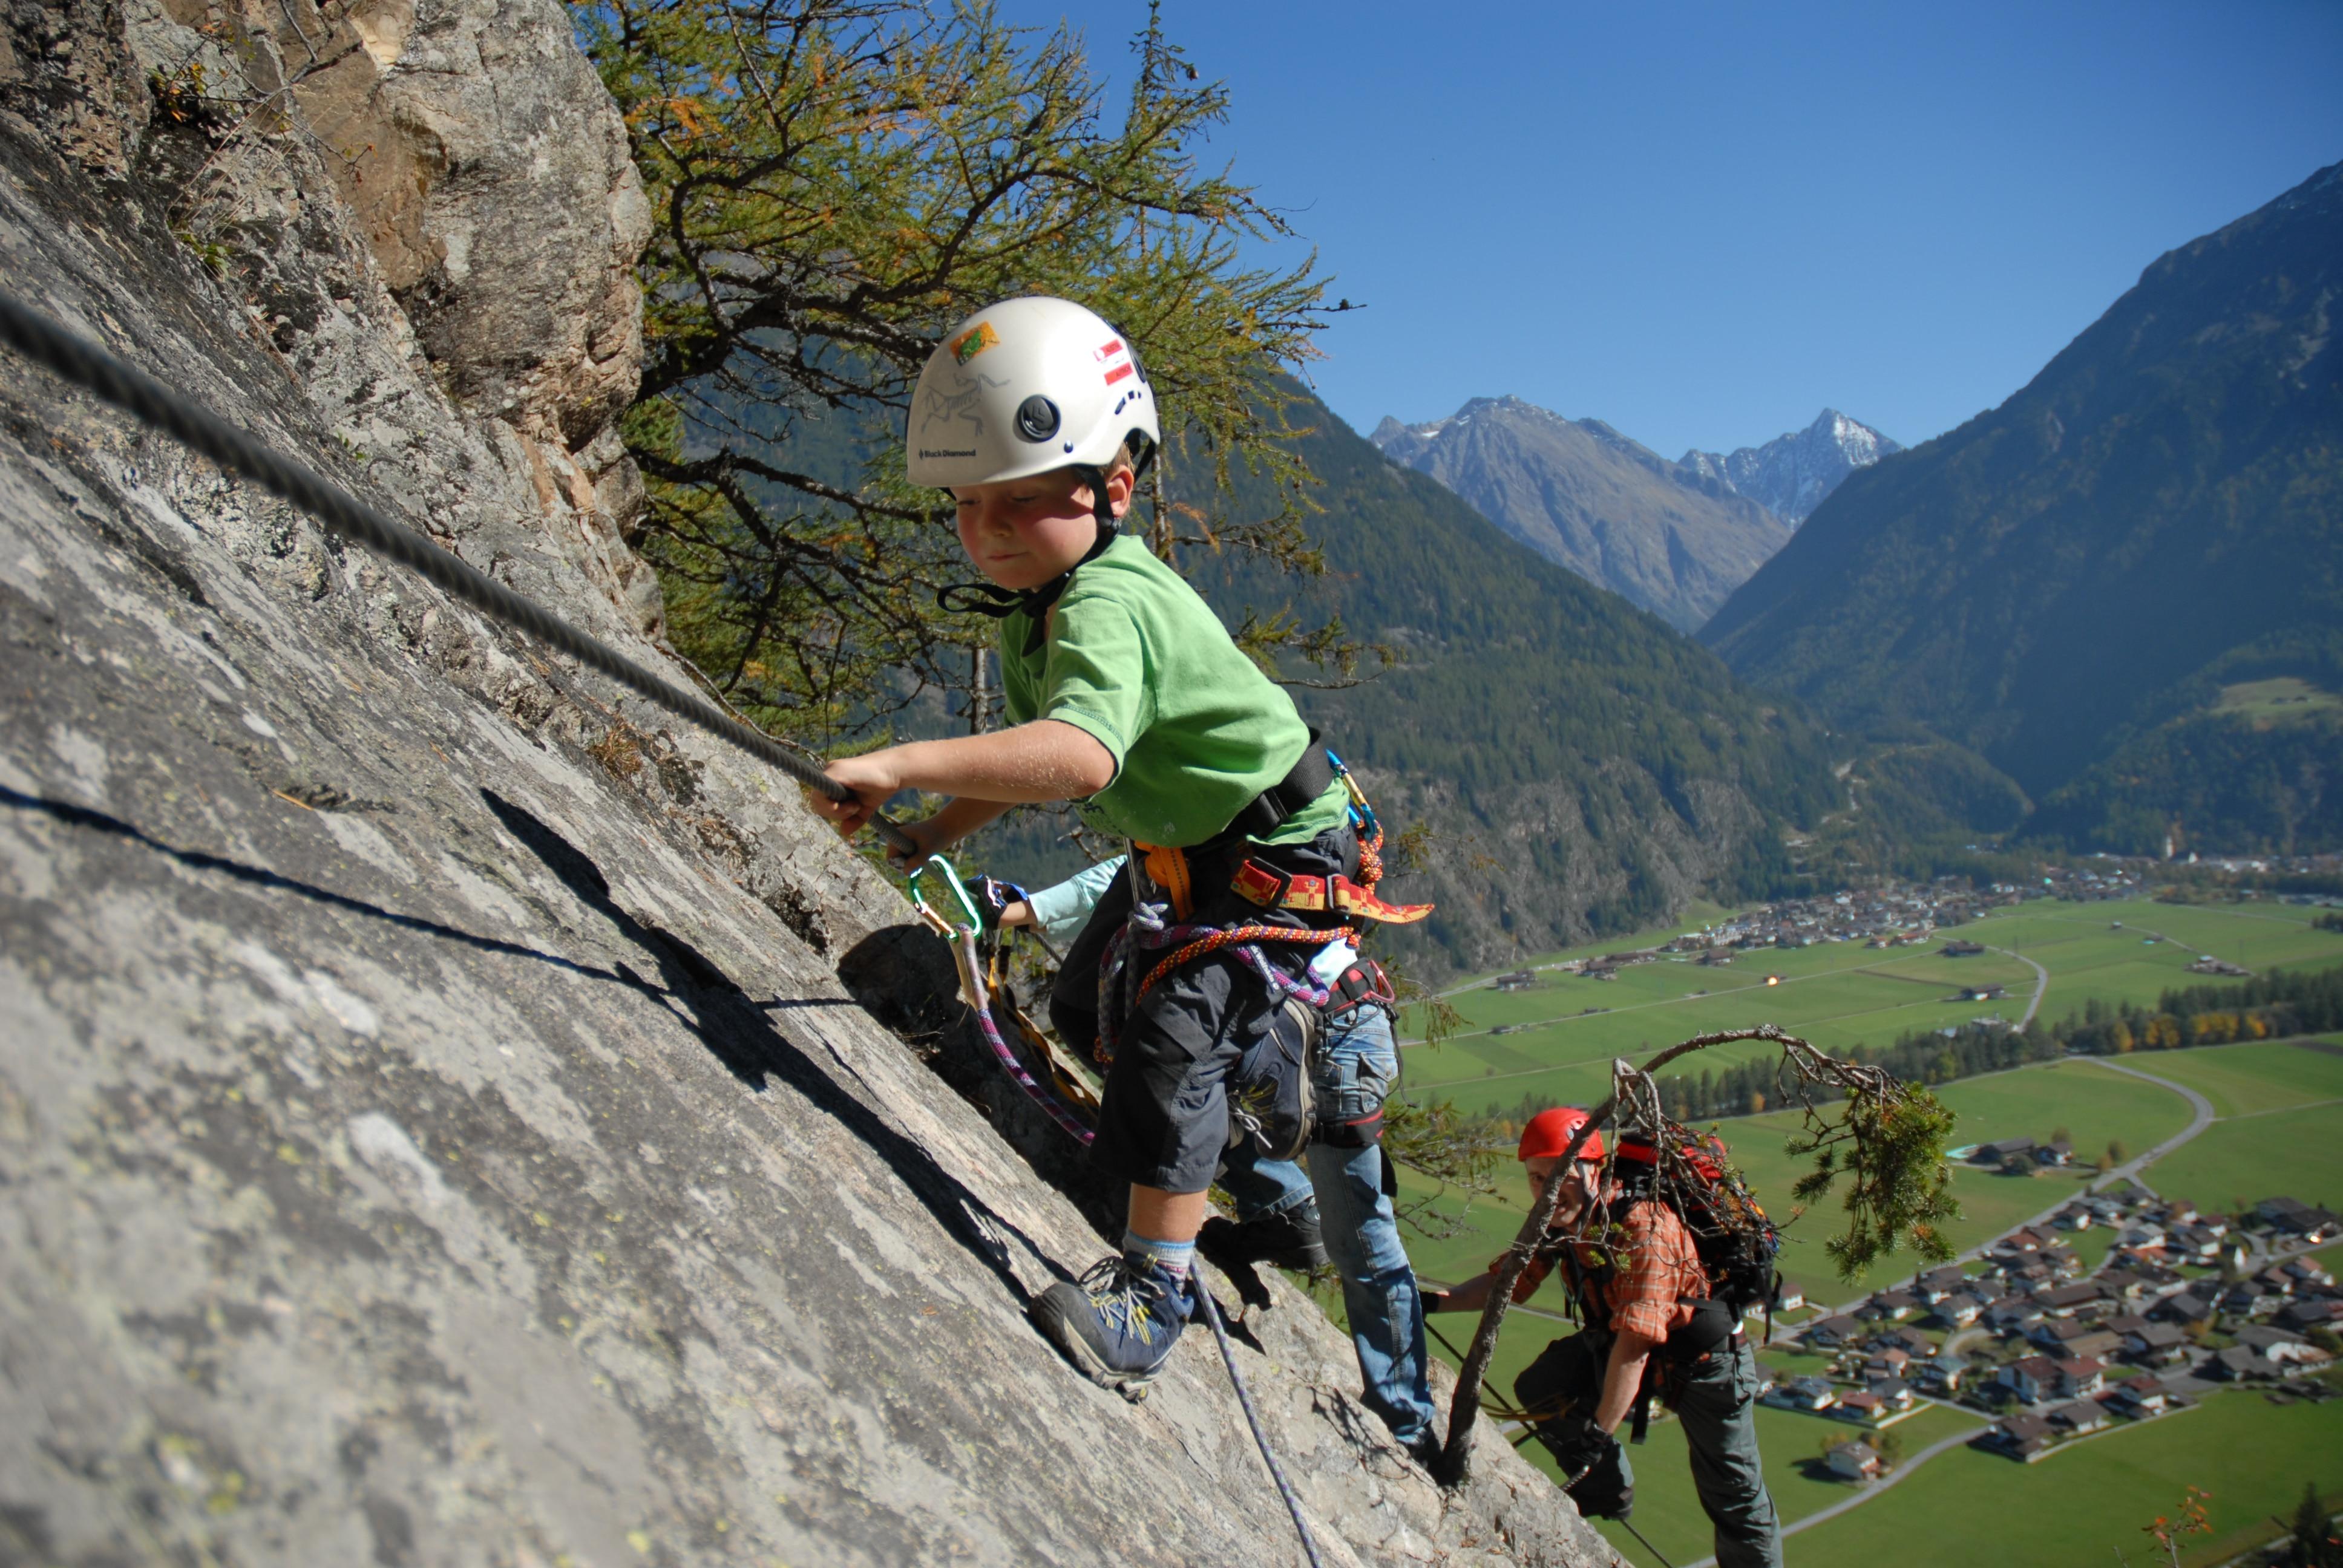 Klettersteigset Kinder : Tipps vom profi: klettersteige mit kindern bergwelten